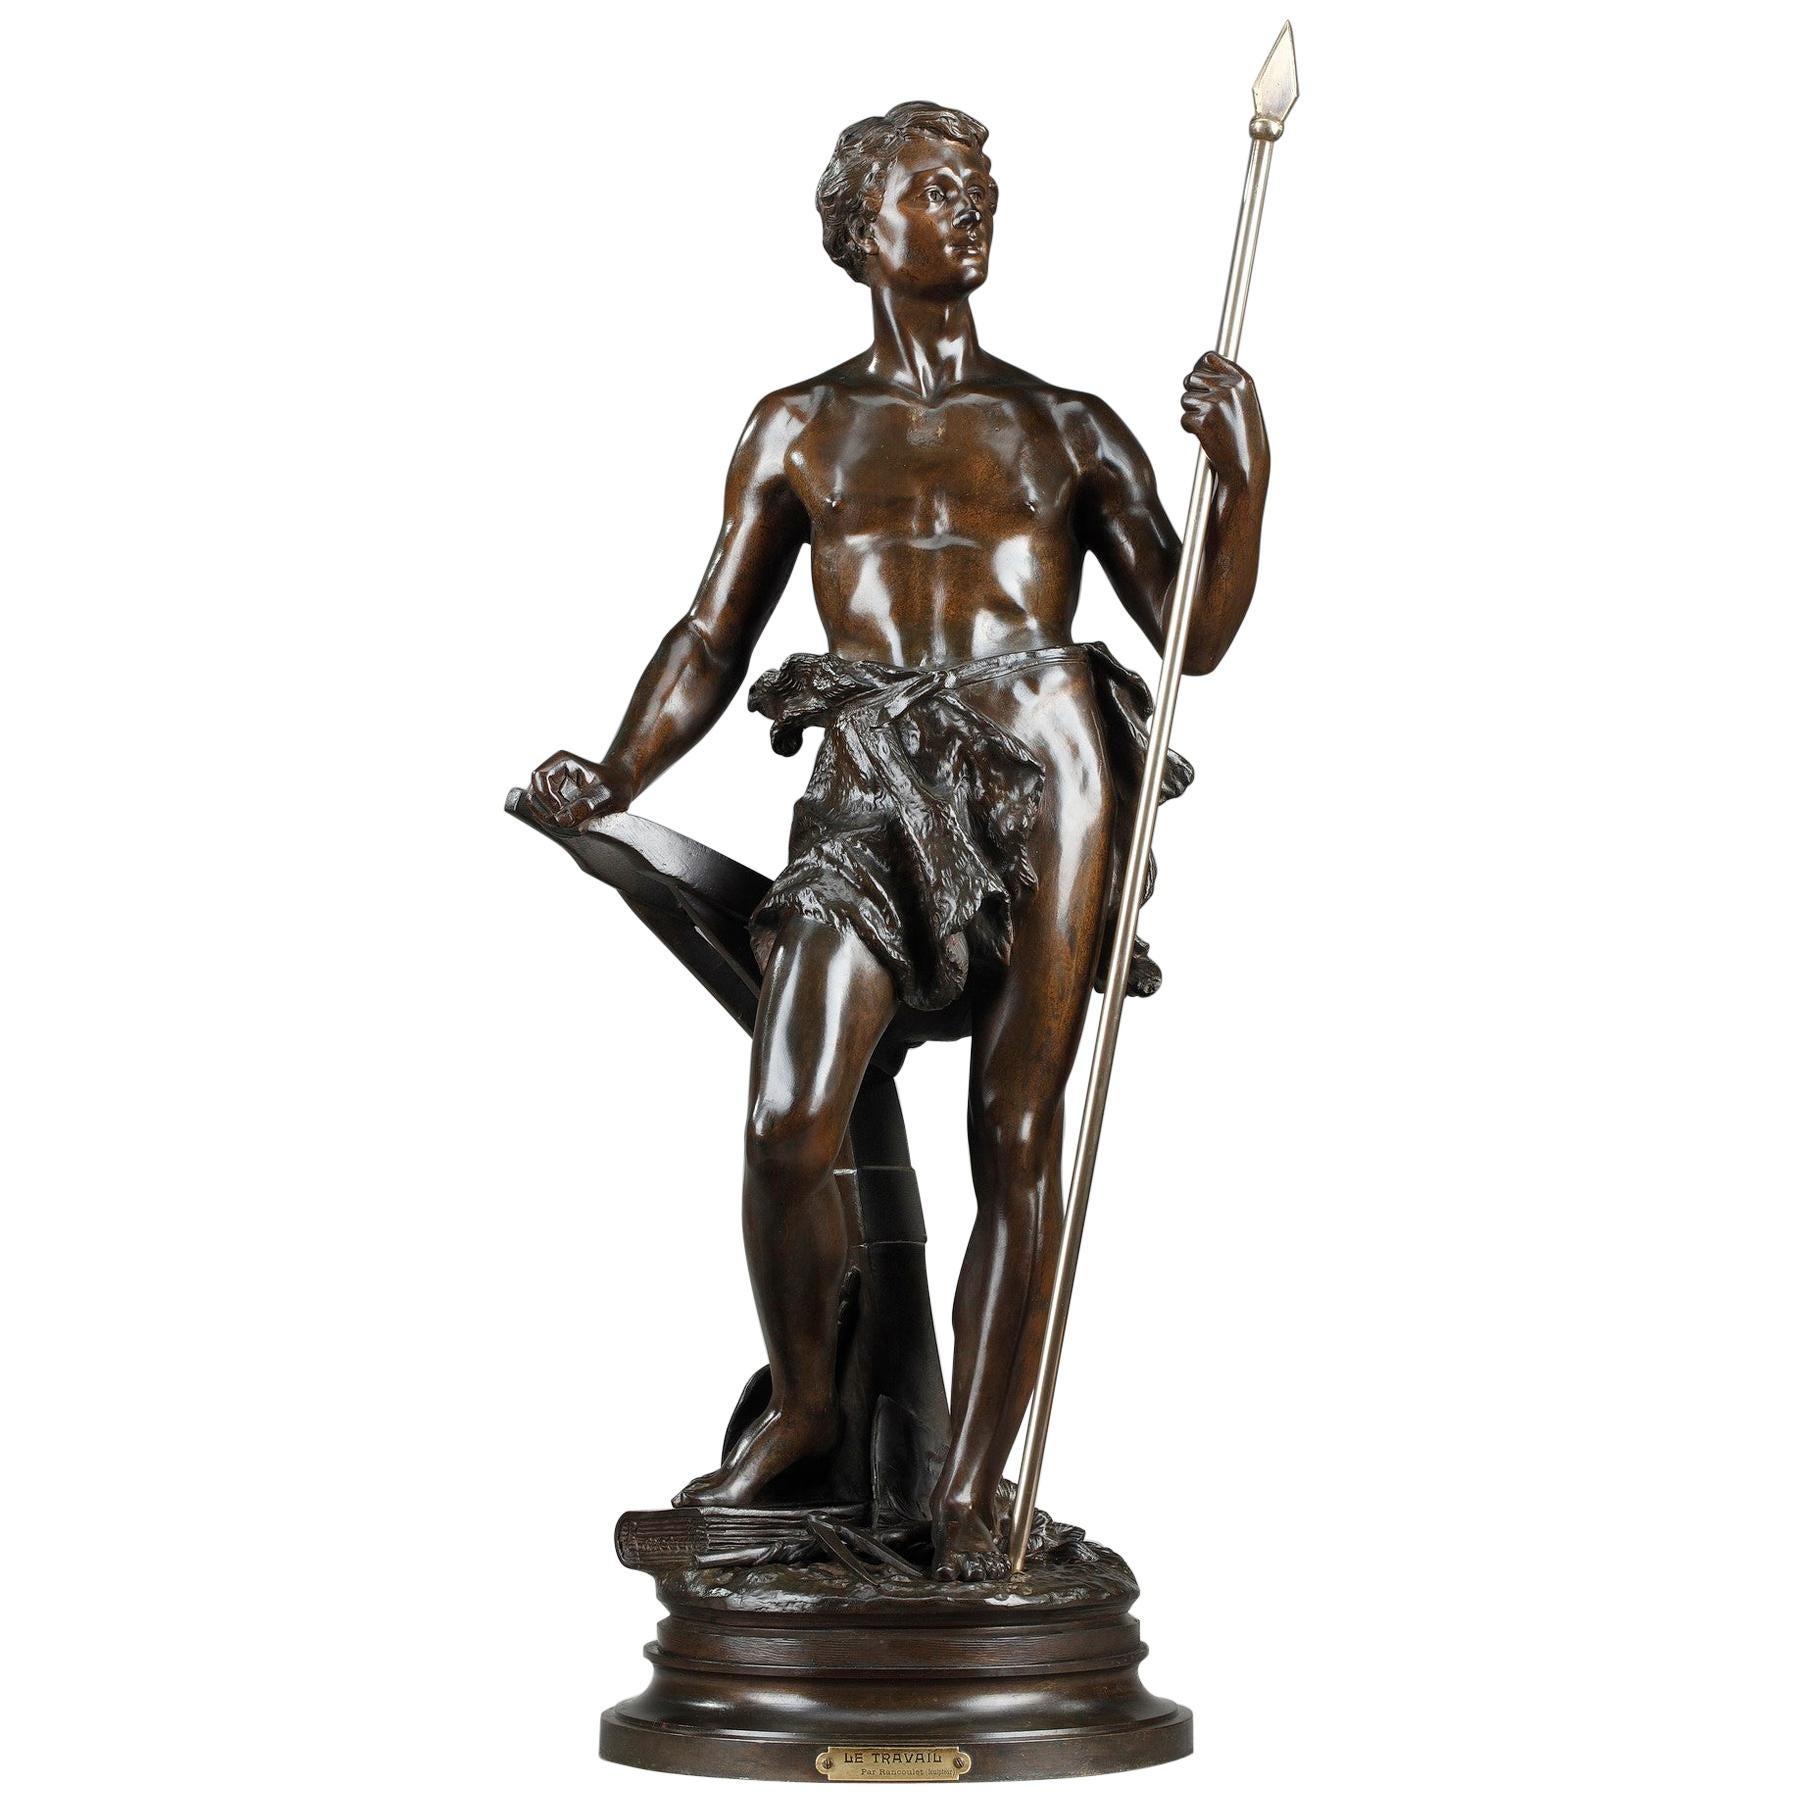 19th Century Bronze Statue: Le Travail, by Ernest Rancoulet